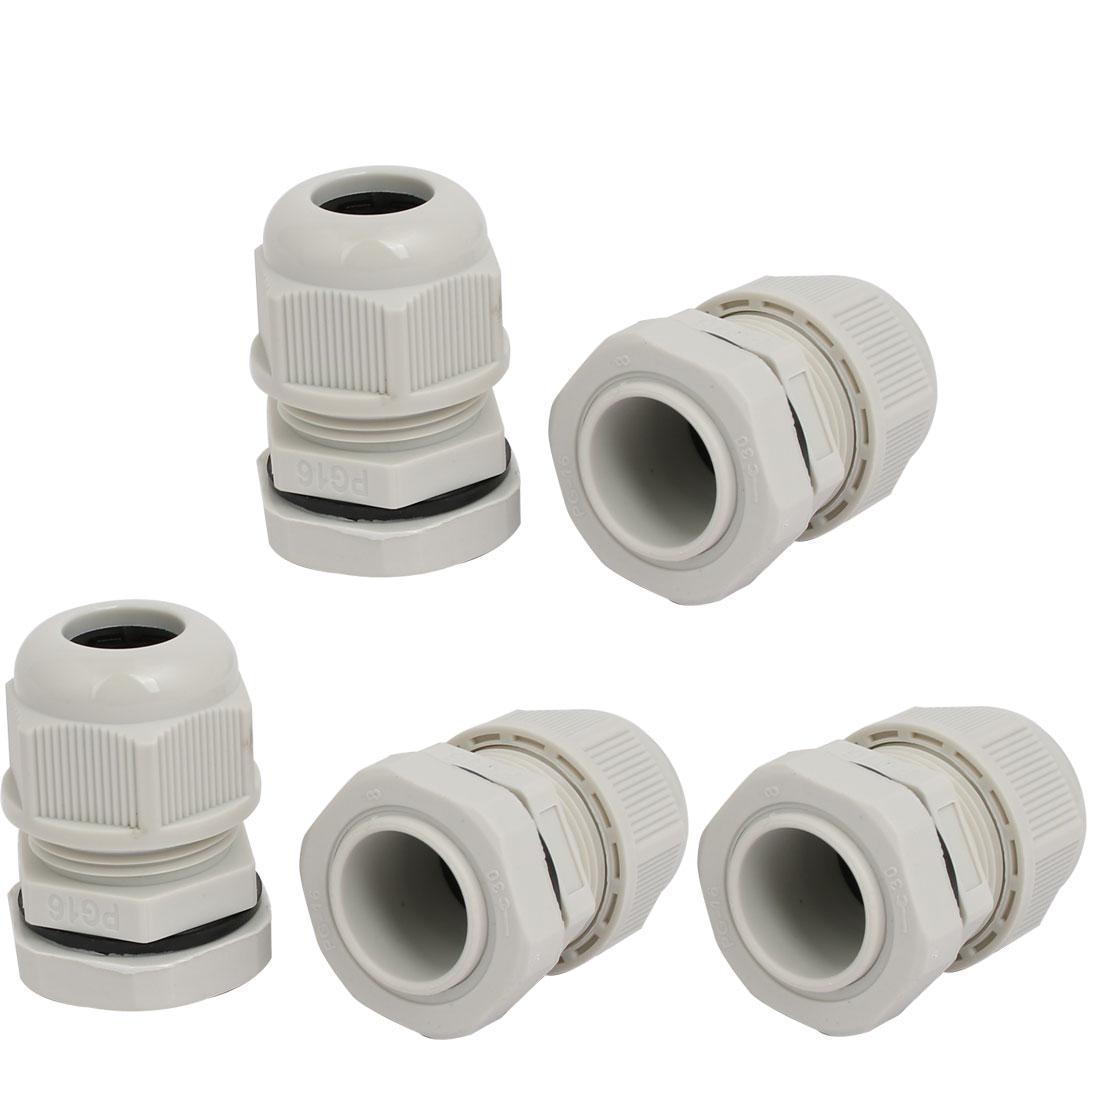 PG16 4mm-6mm Range Nylon 2 Holes Adjustable Cables Gland Connector Gray 5pcs